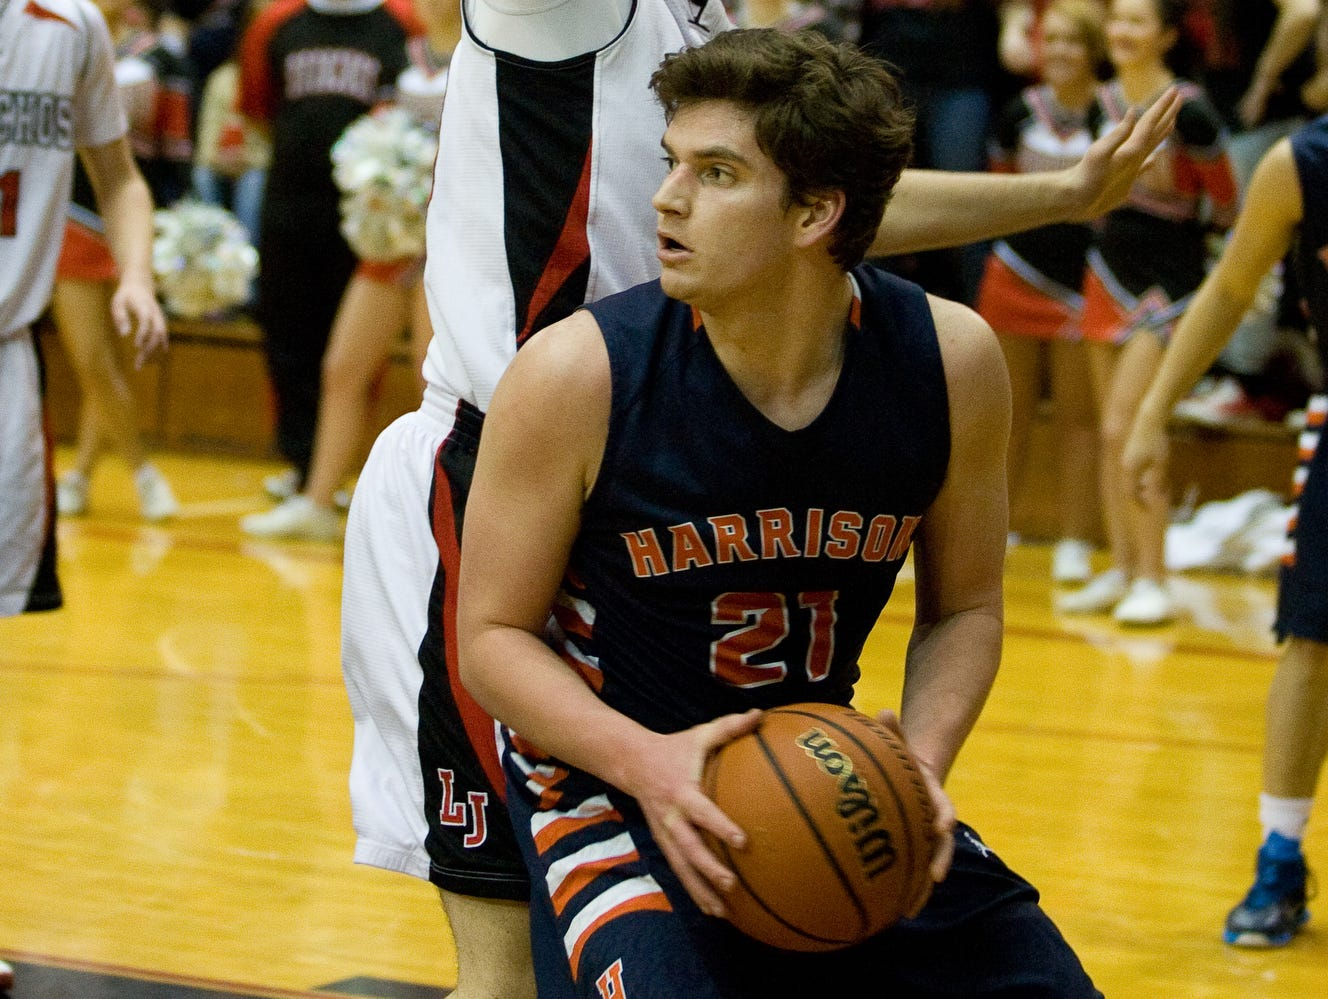 Aidan Hannon is one of the few veterans on the Harrison boys basketball team.